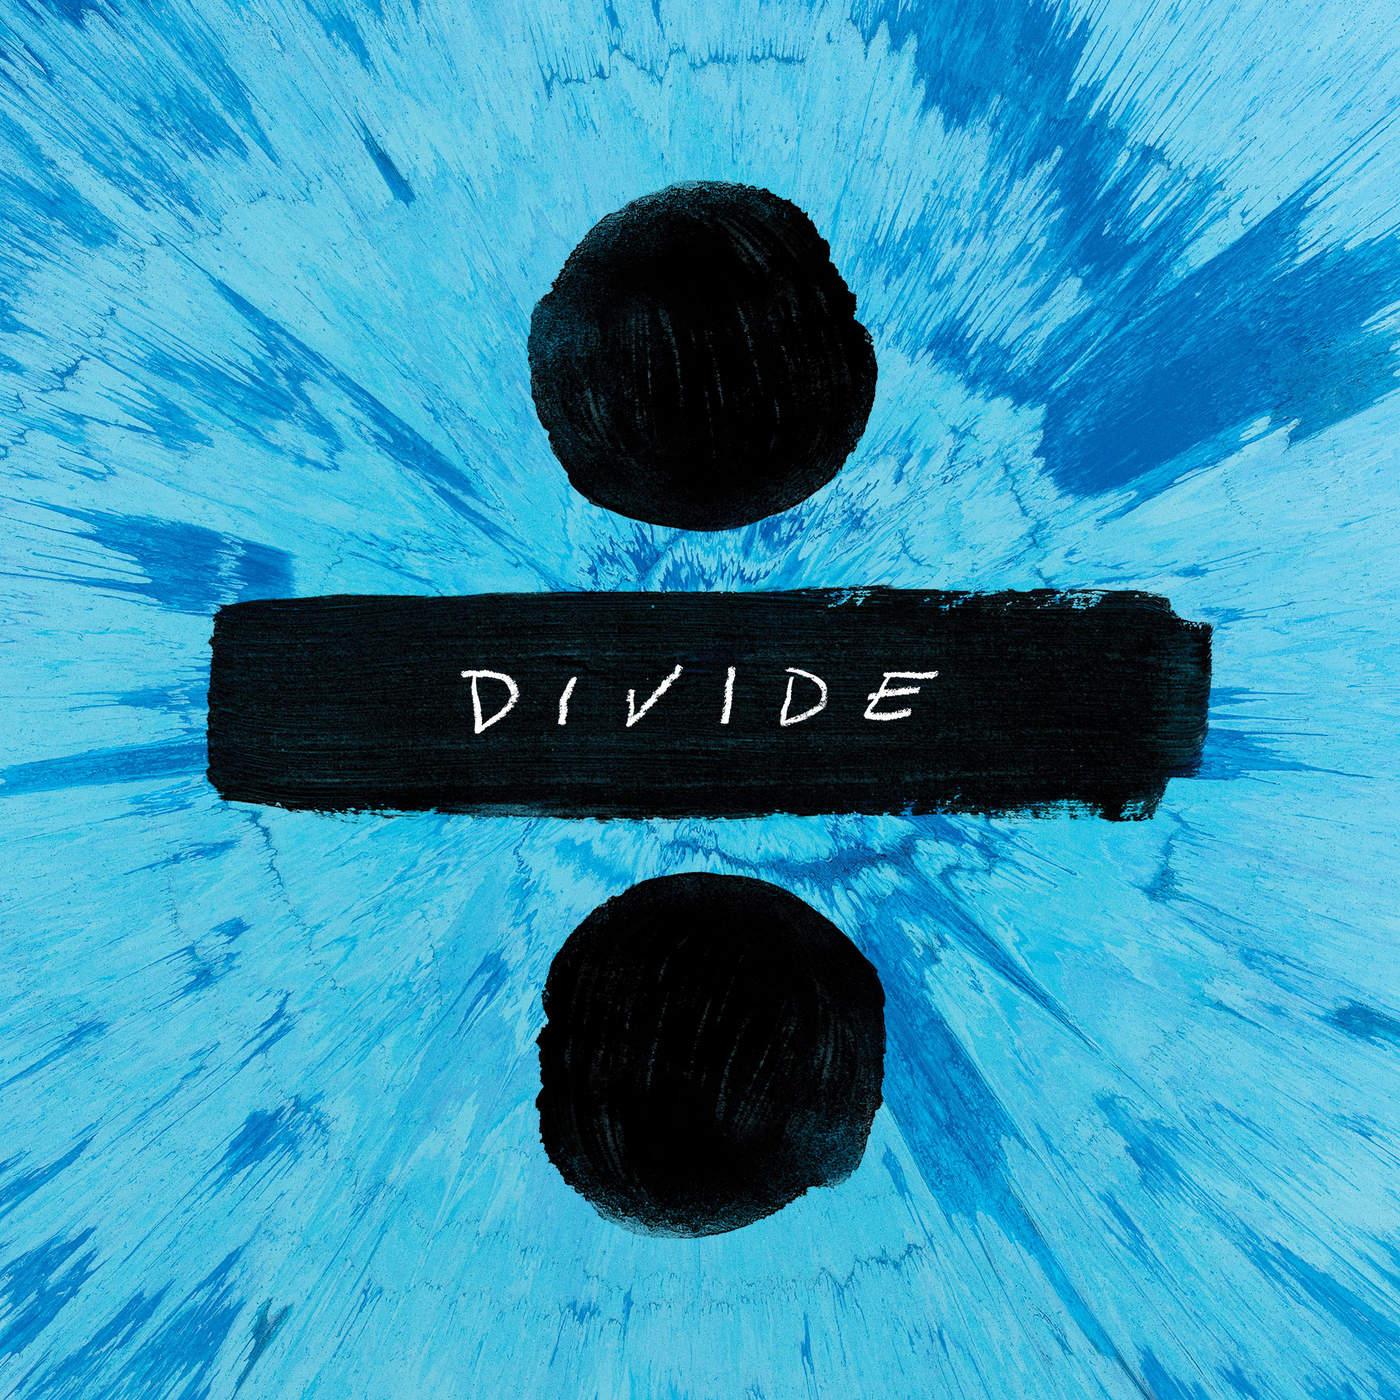 Ed Sheeran - Perfect (Mike Perry Remix) - Single